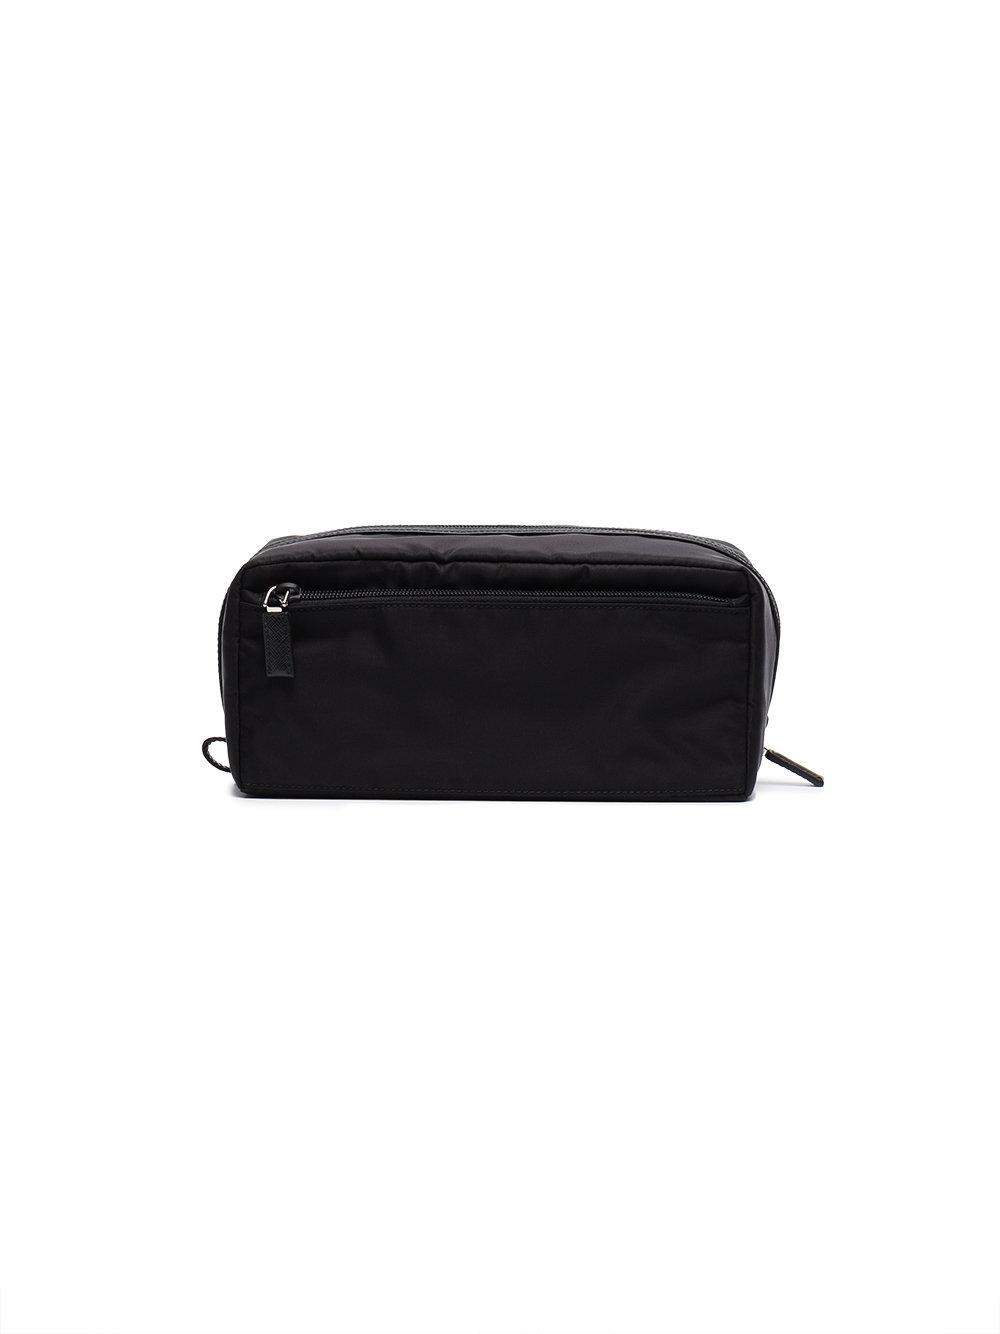 4789fcacda7 Prada - Black Logo Wash Bag for Men - Lyst. View fullscreen